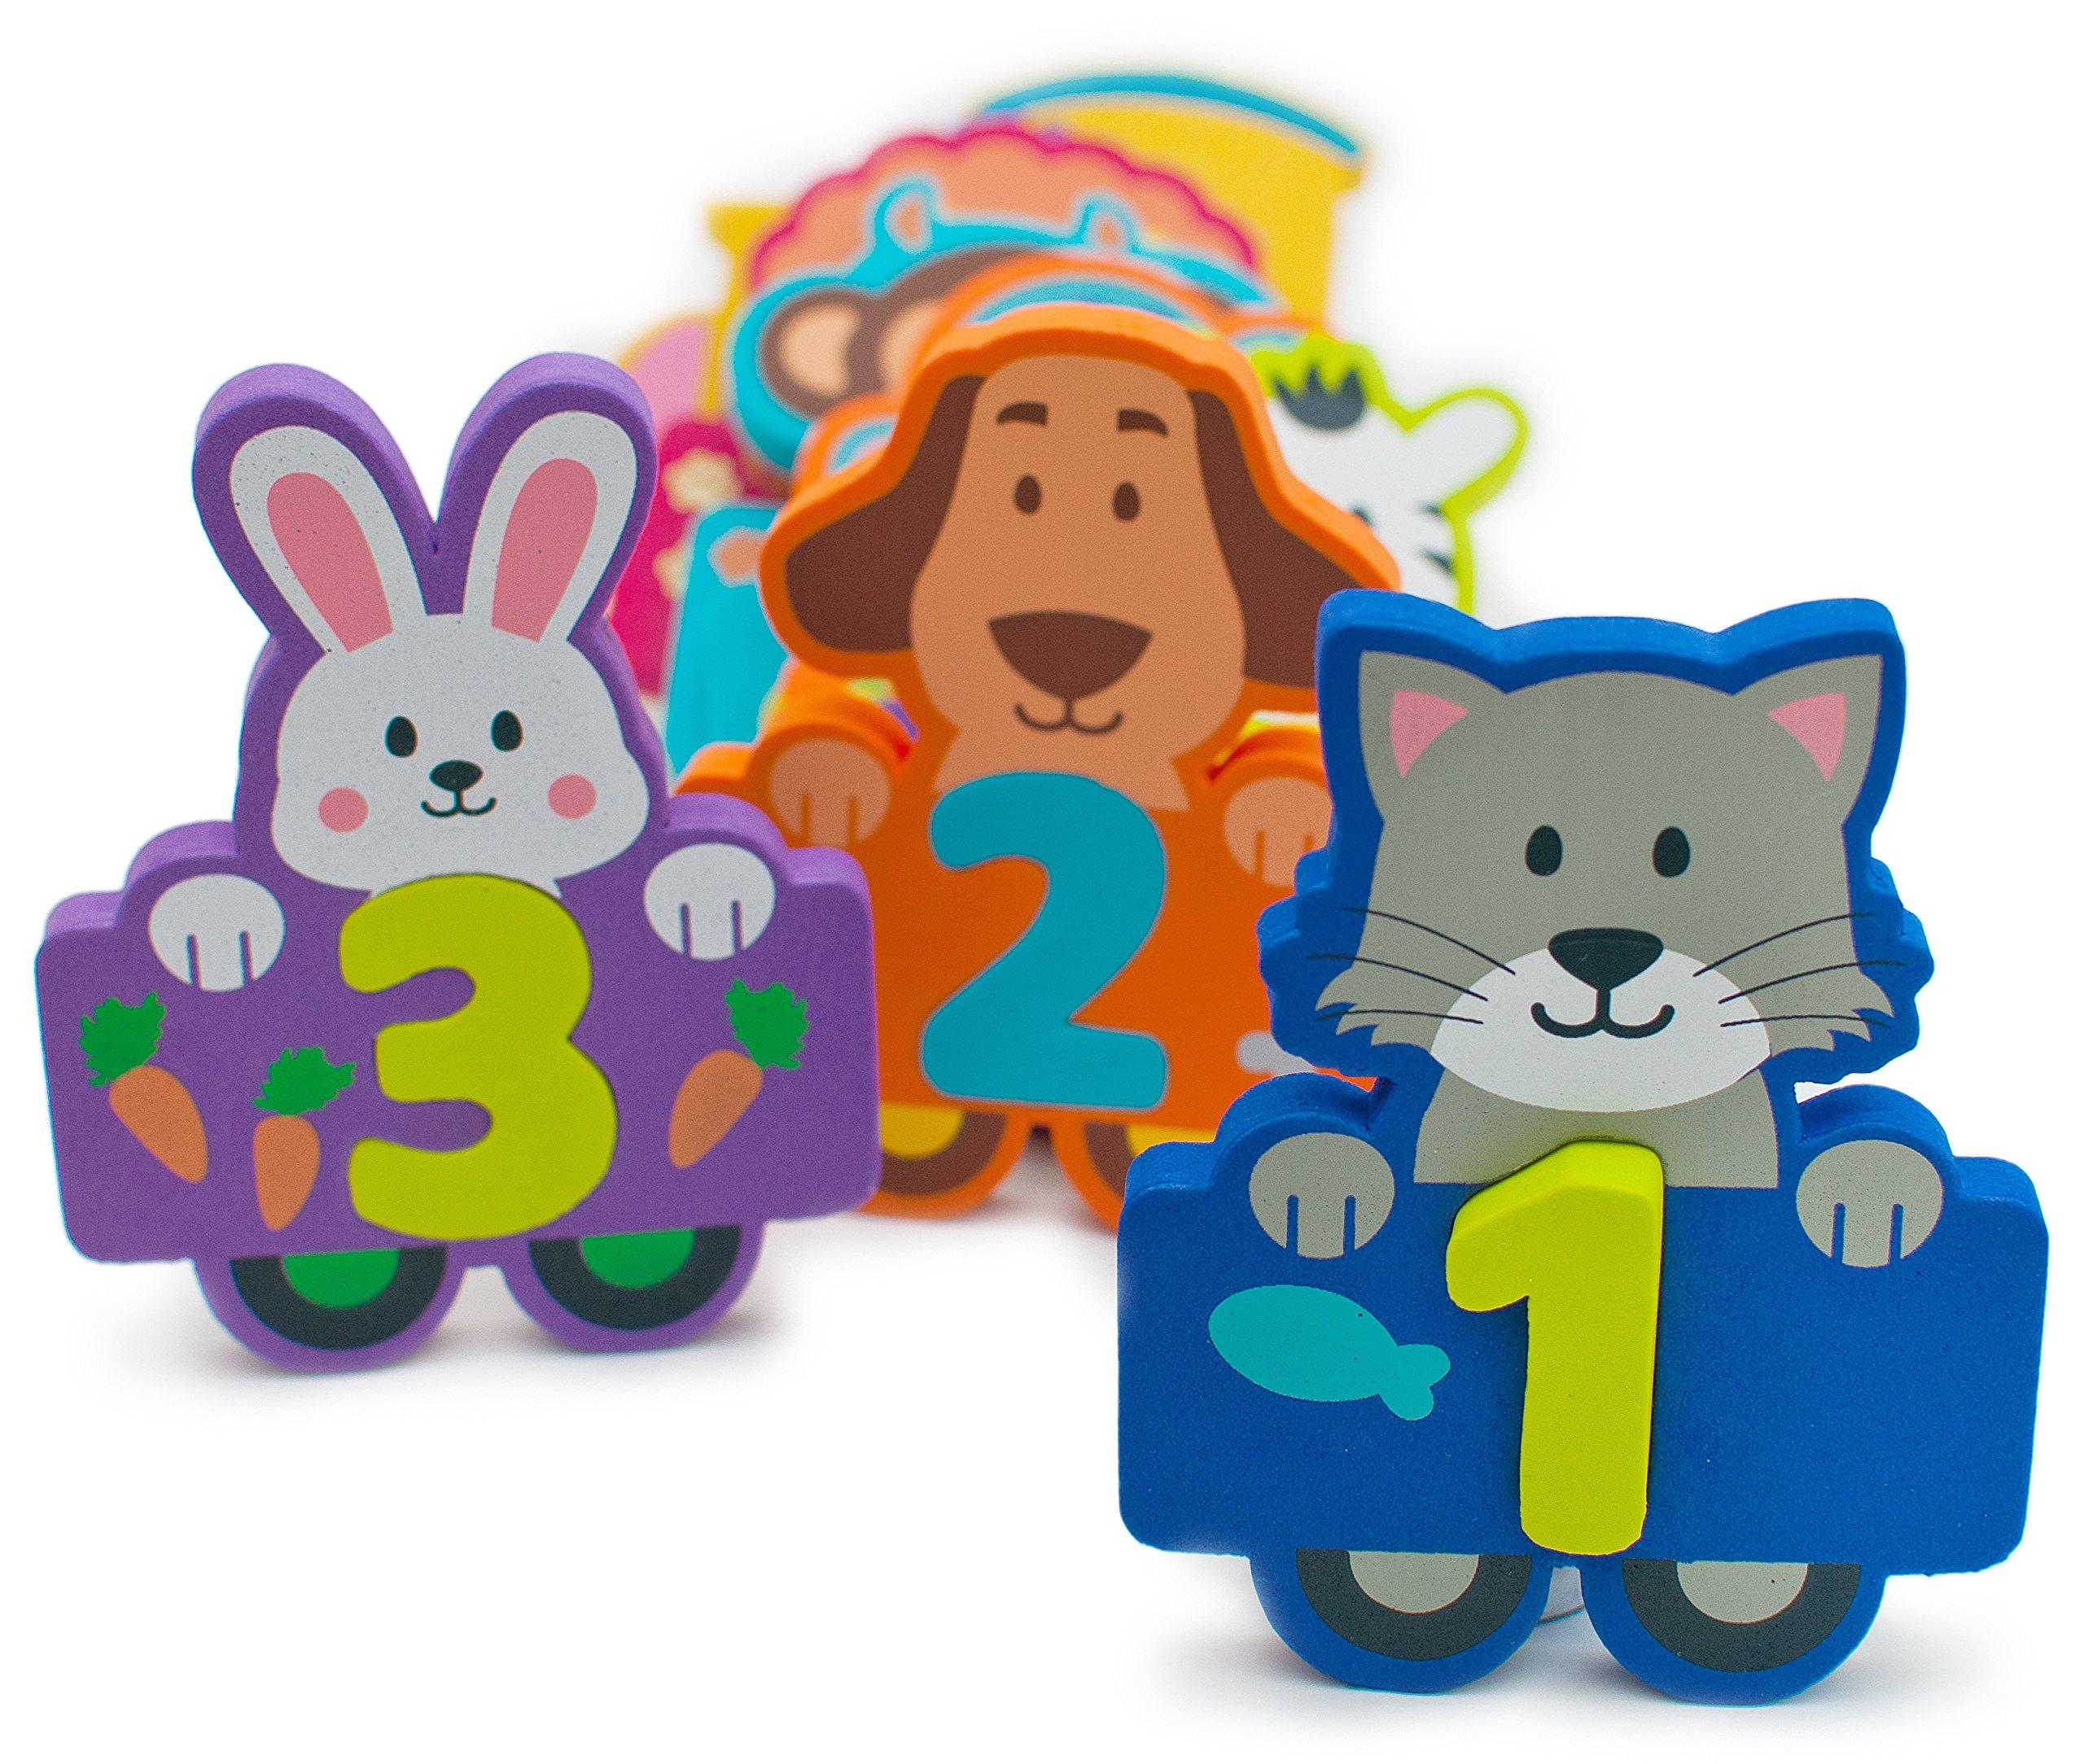 Foam Bath Toys Numbers Animals - Best Baby Bath Toy for Toddlers Kids Girls Boys - Non Toxic Bath Numbers Toy Set of 27pcs - Preschool Educational Floating Bathtub Toys - Bath Toy Storage Mesh Bag